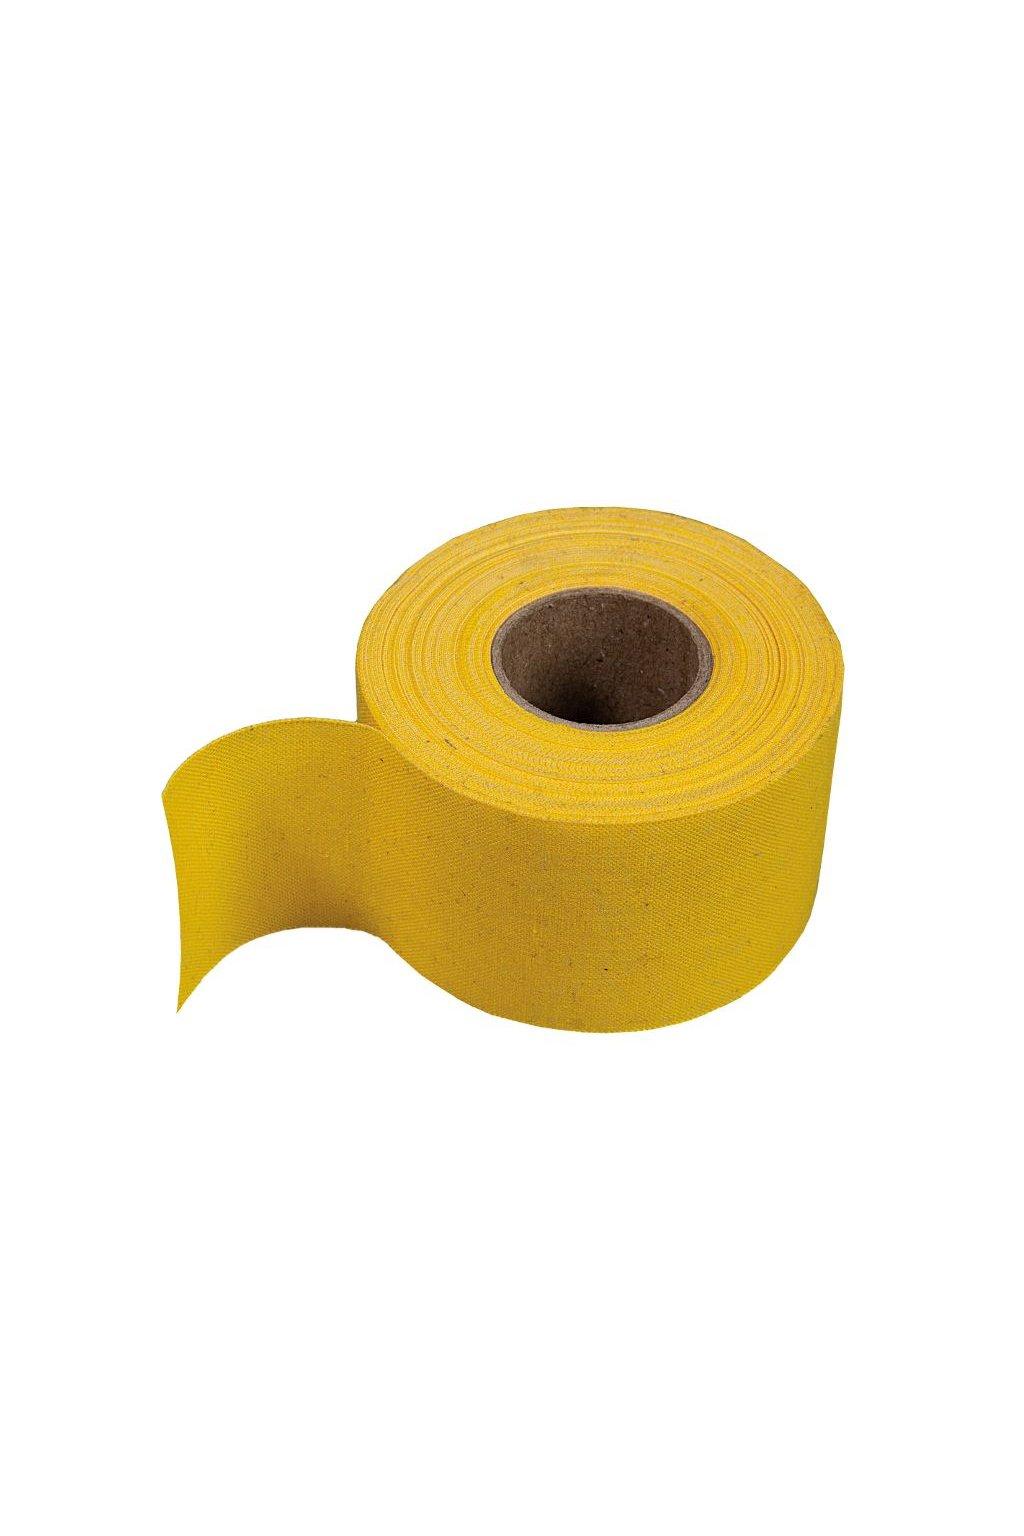 tejpovaci naplast singingrock super tape 3 8 cm zluta